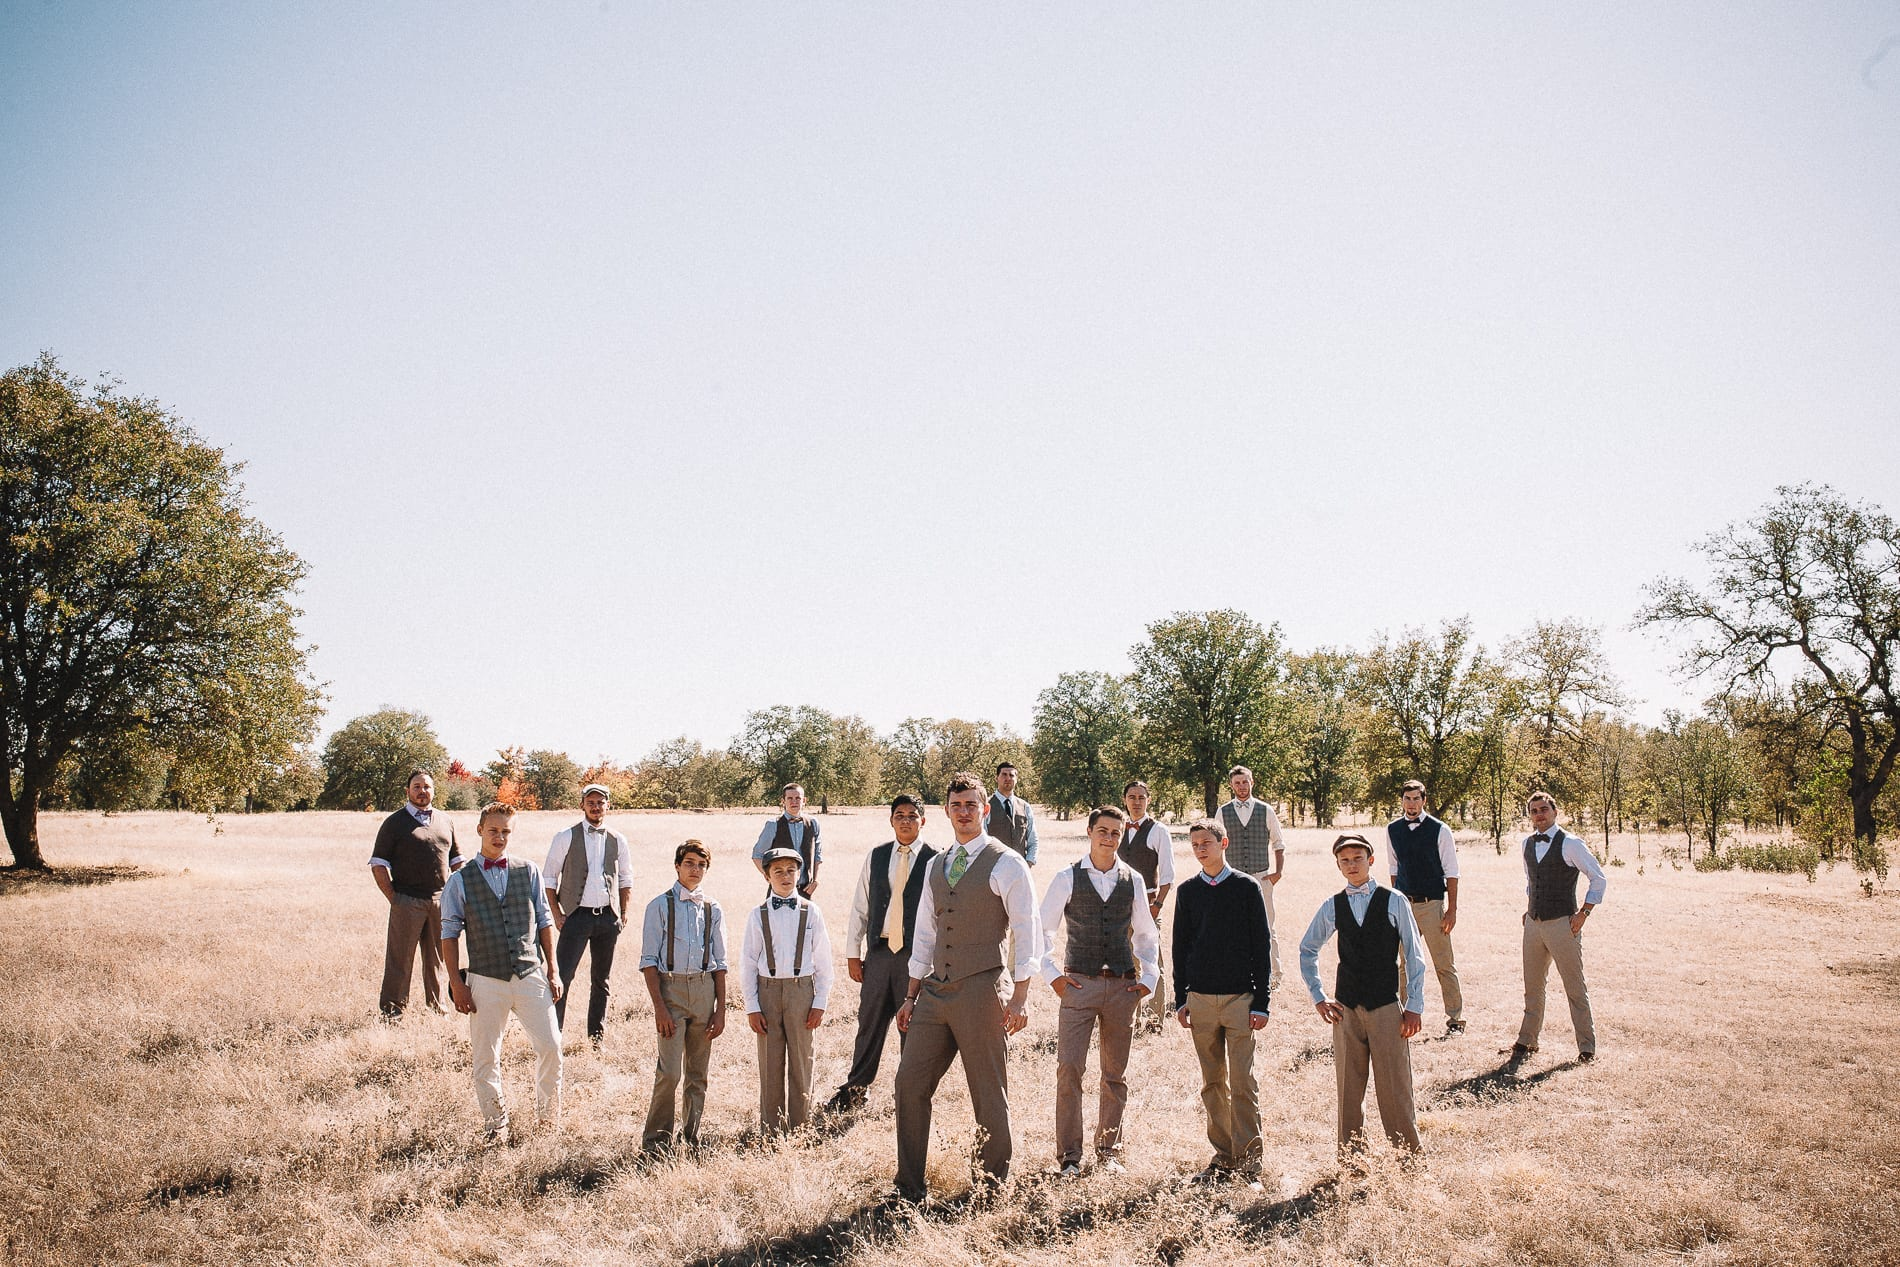 redding-twin-view-lema-ranch-wedding-photo-21